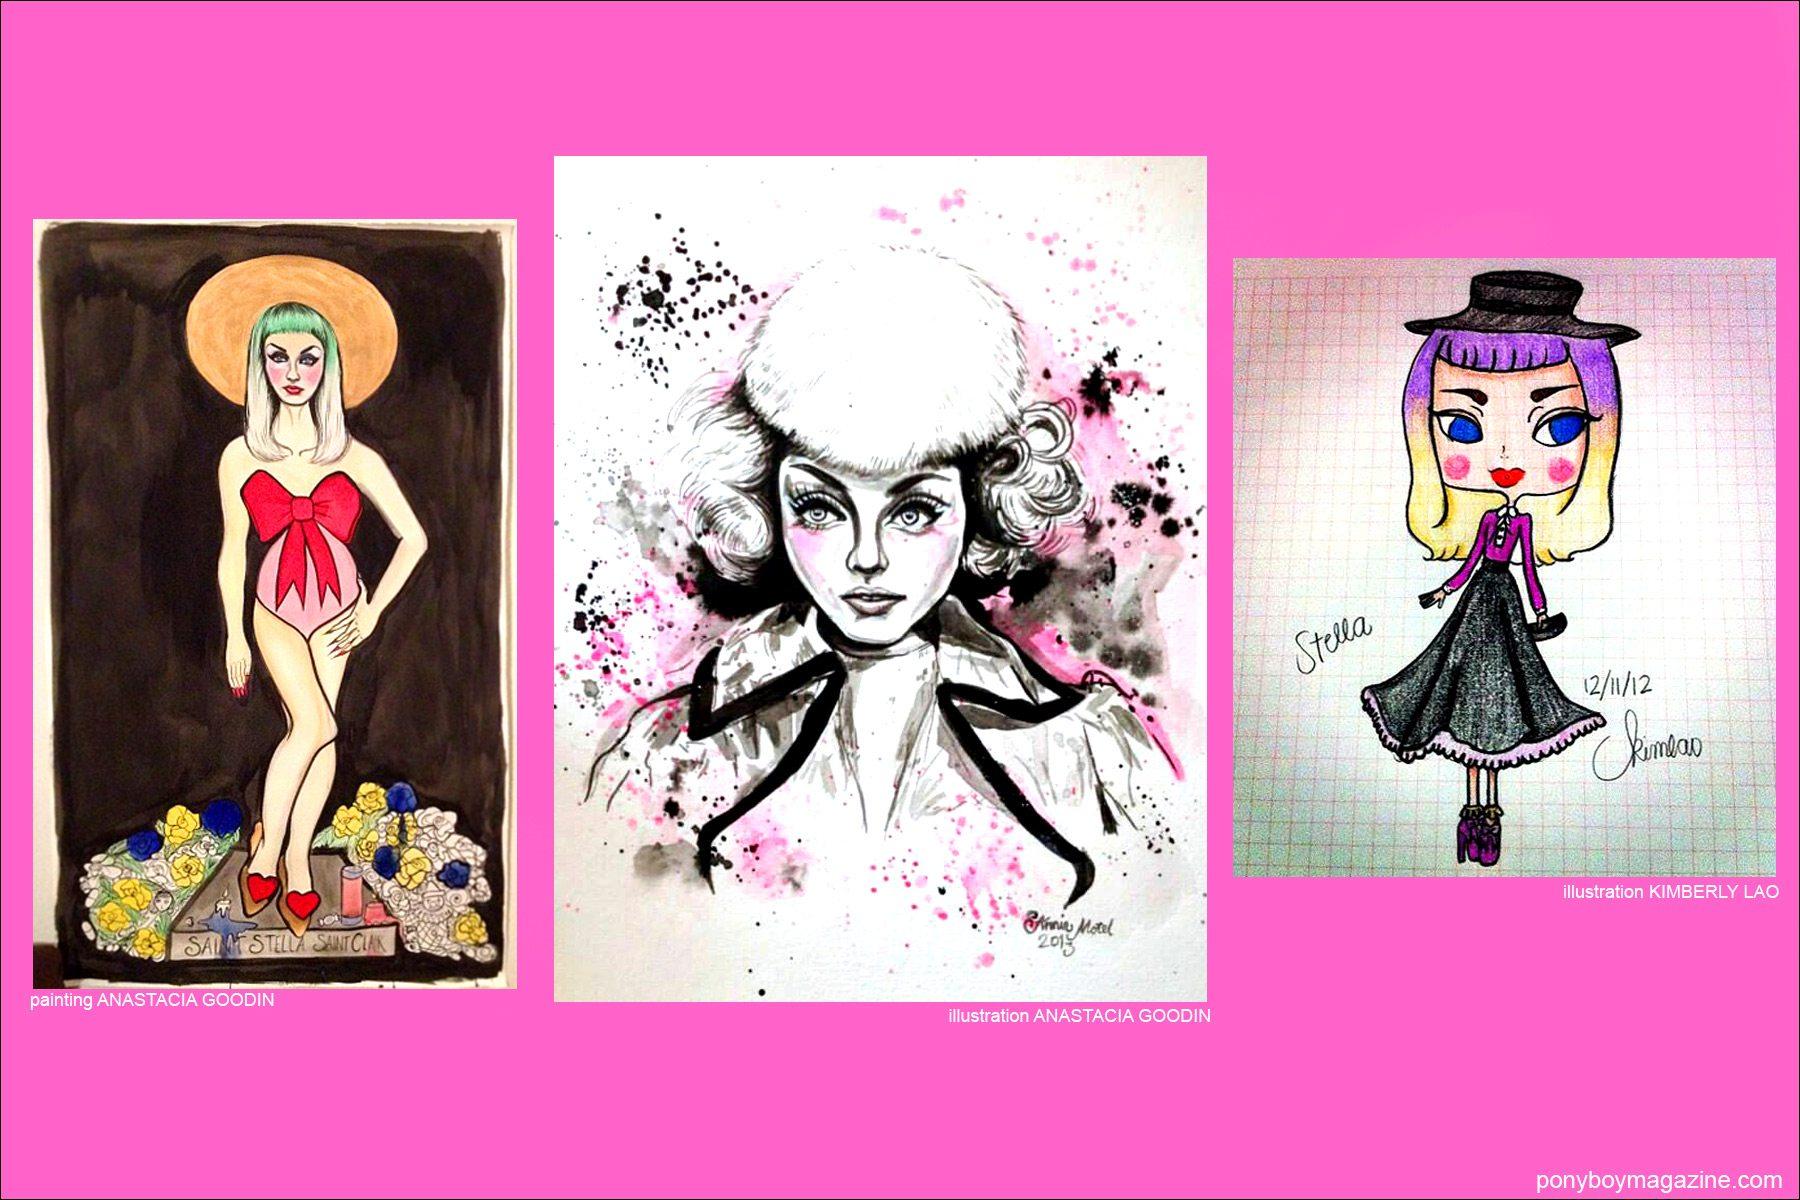 Artwork of model Stella Rose Saint Clair for Ponyboy Magazine New York City.